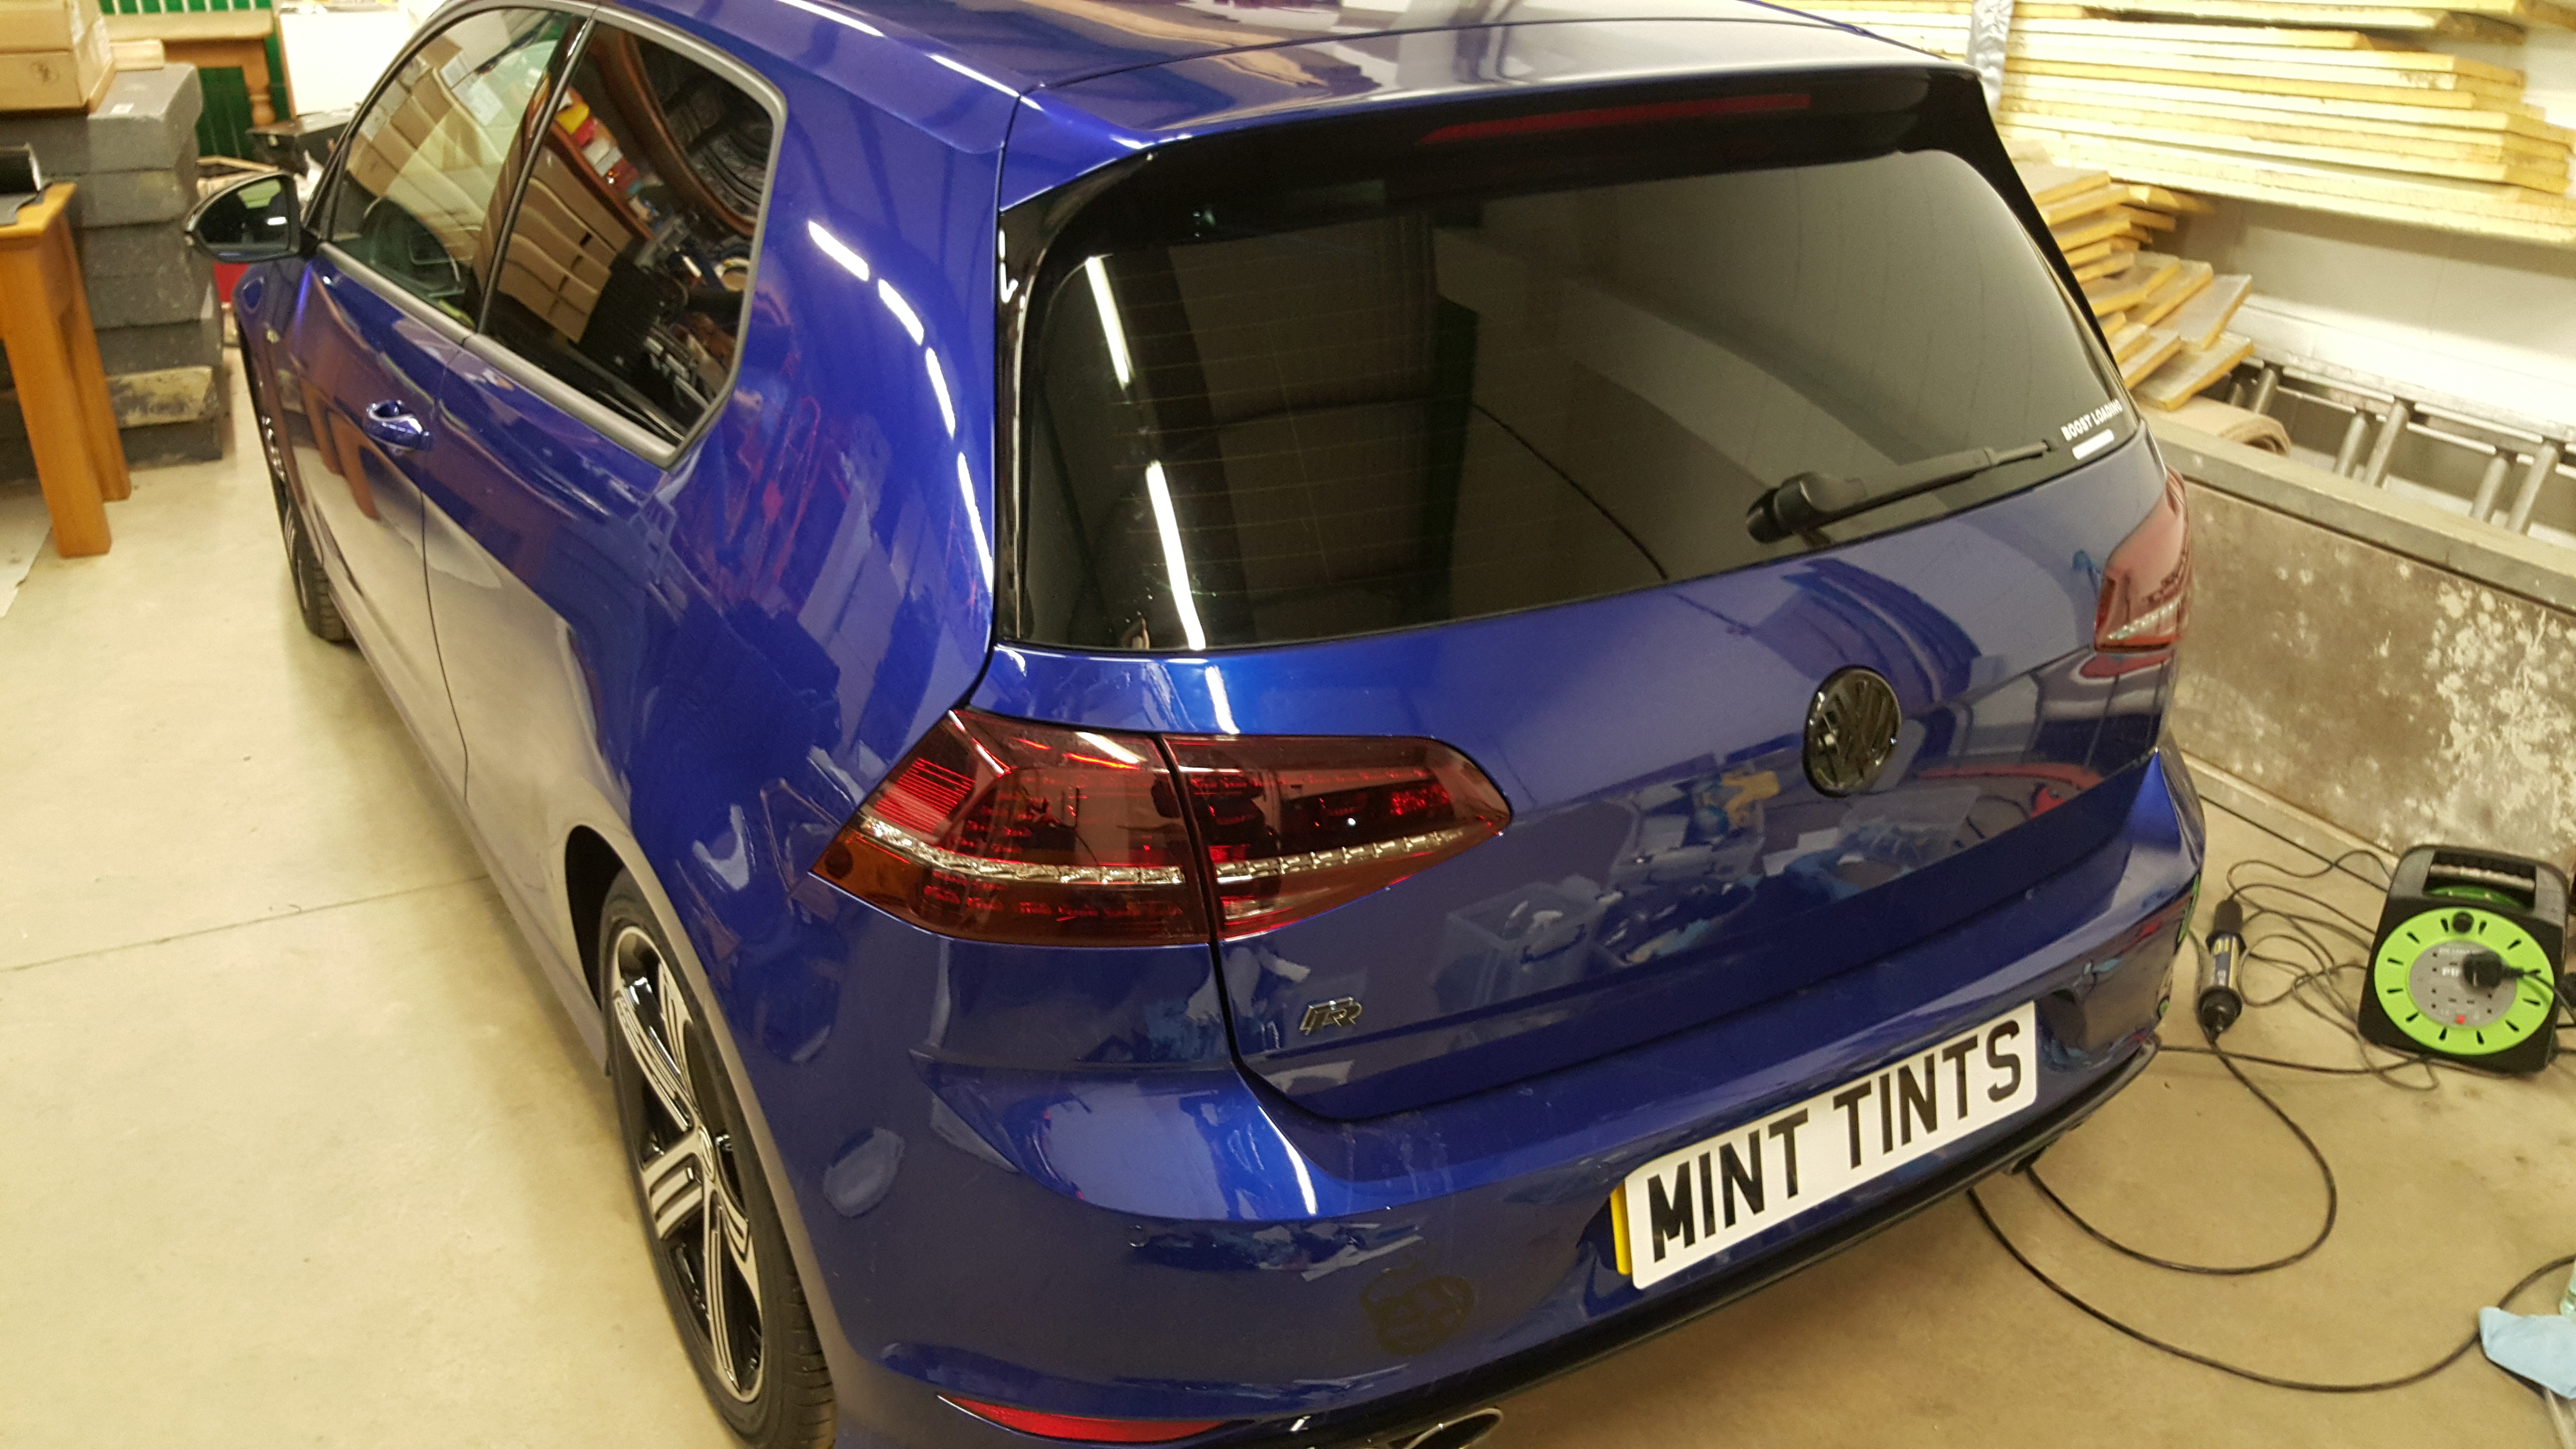 VW Golf R - 20% Dark Smoke Tints